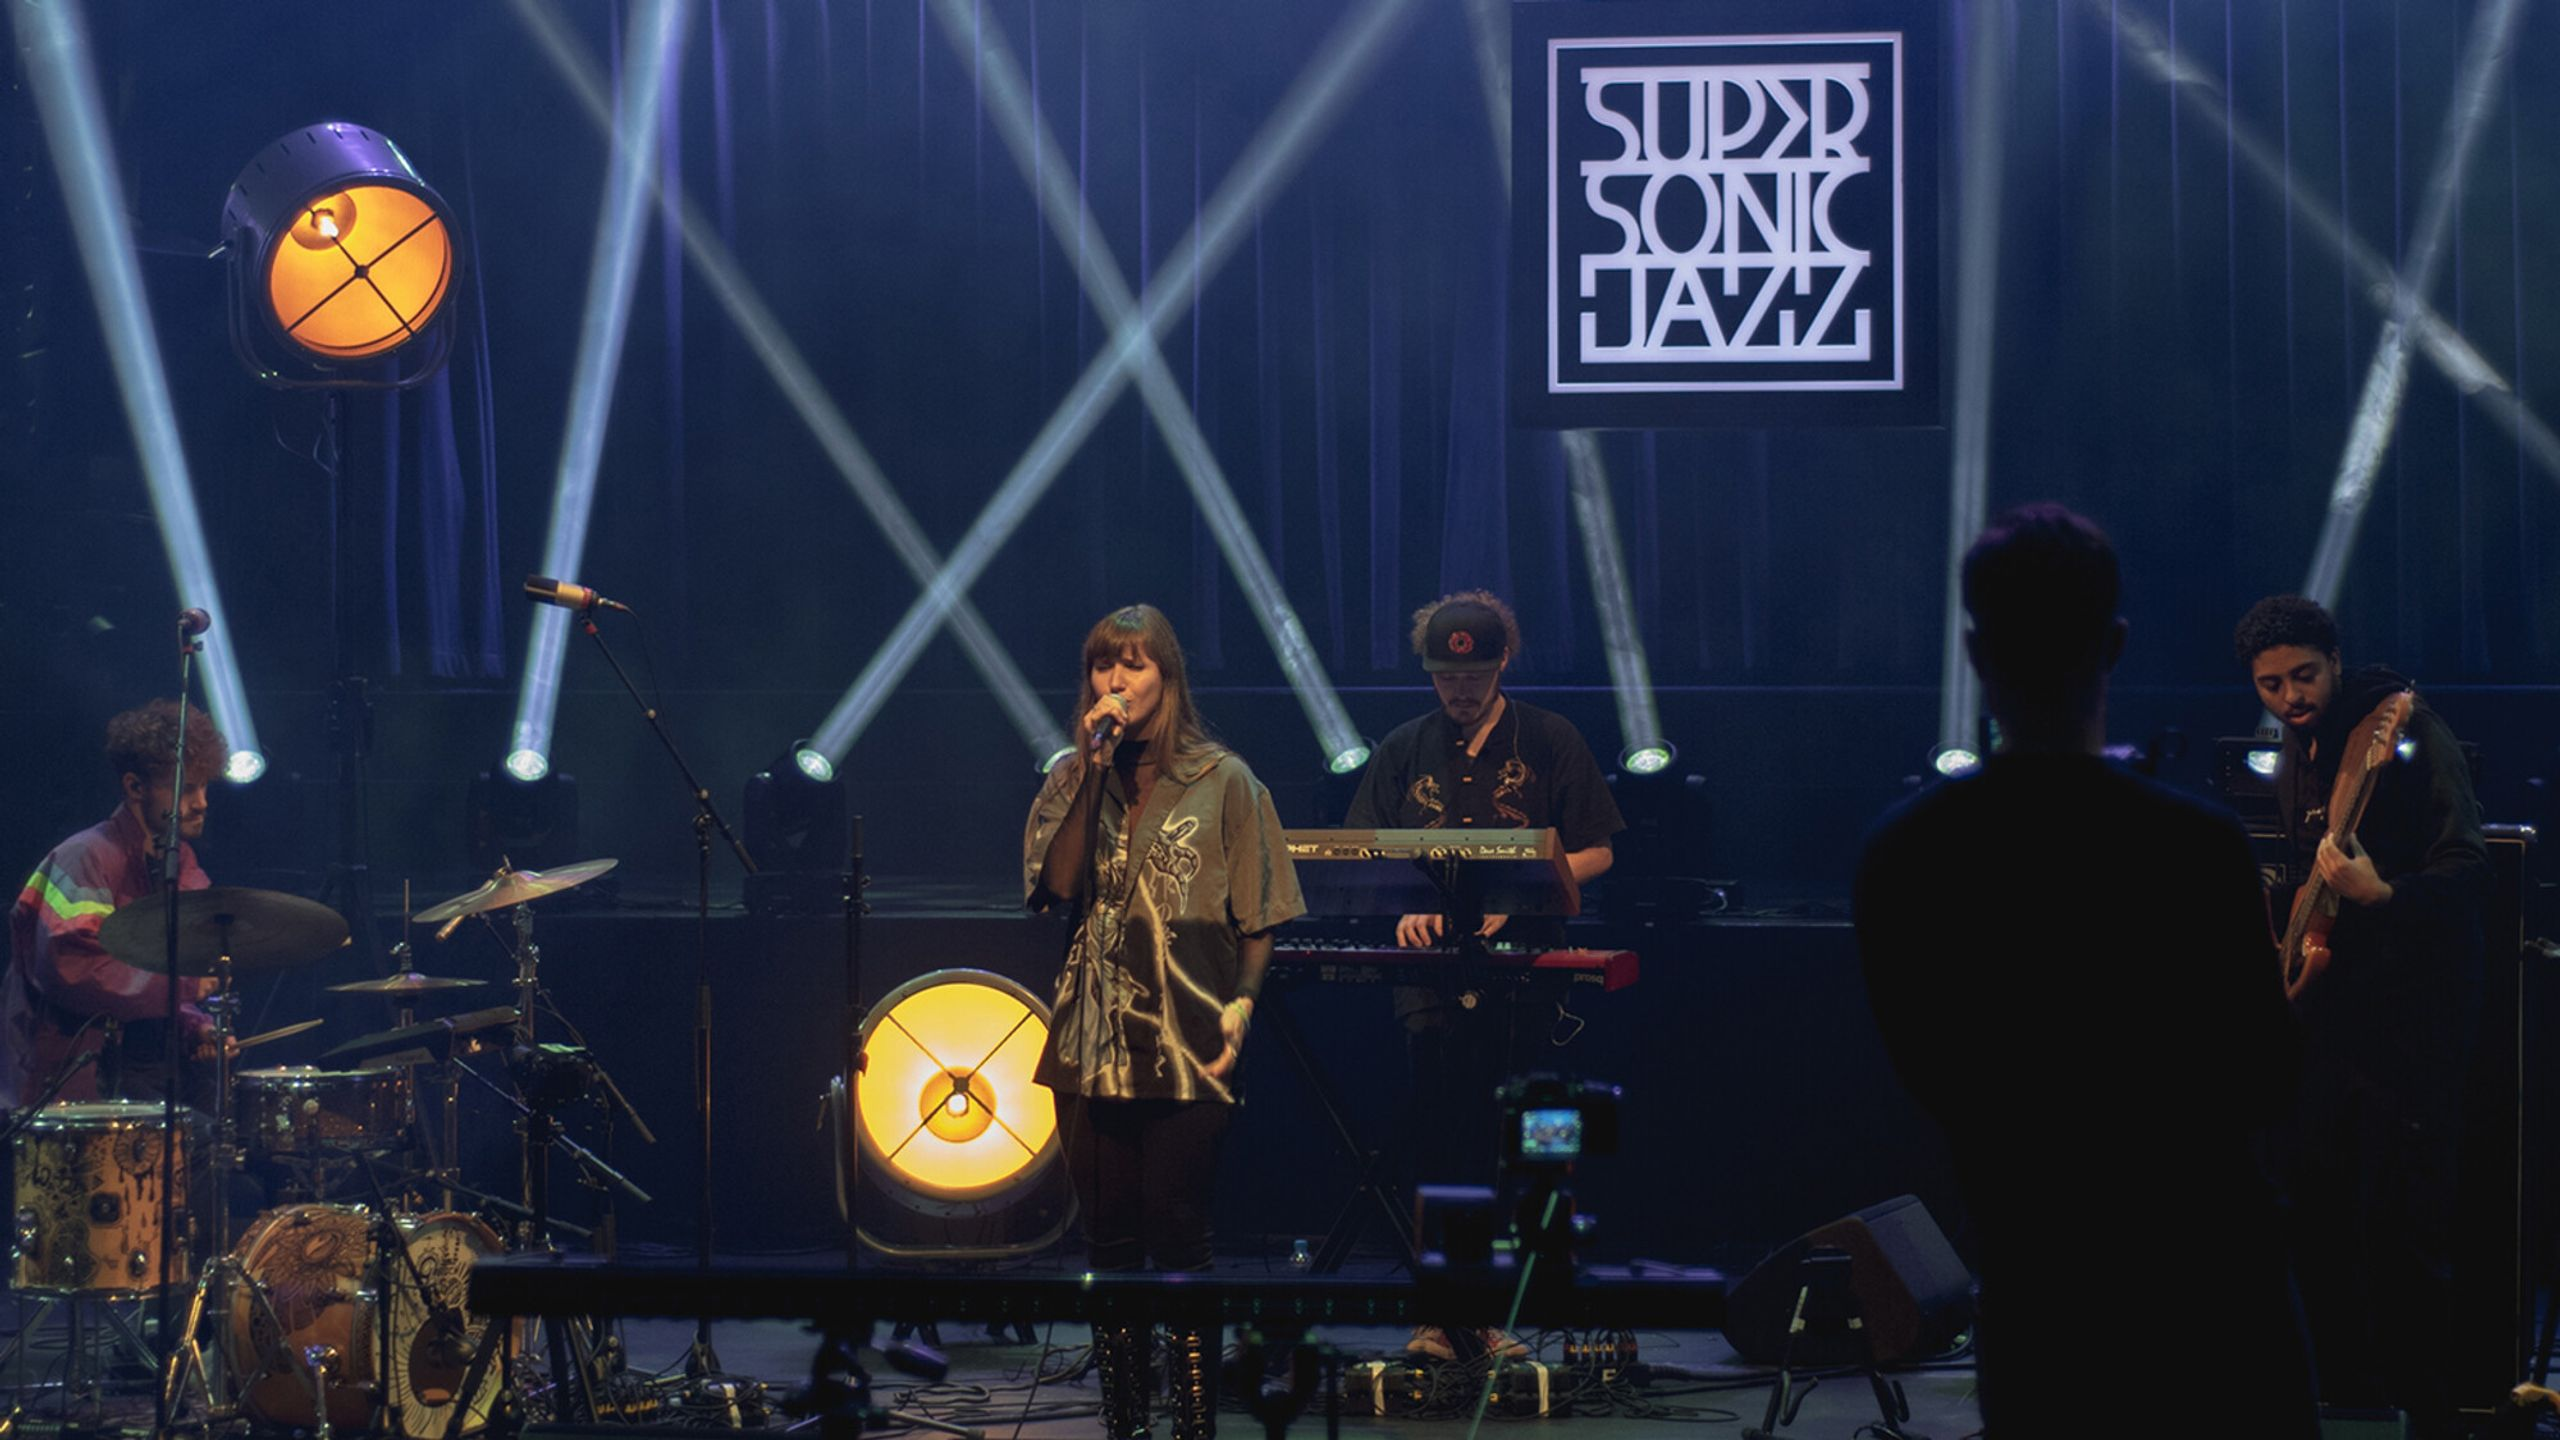 Super-Sonic Jazz 2020